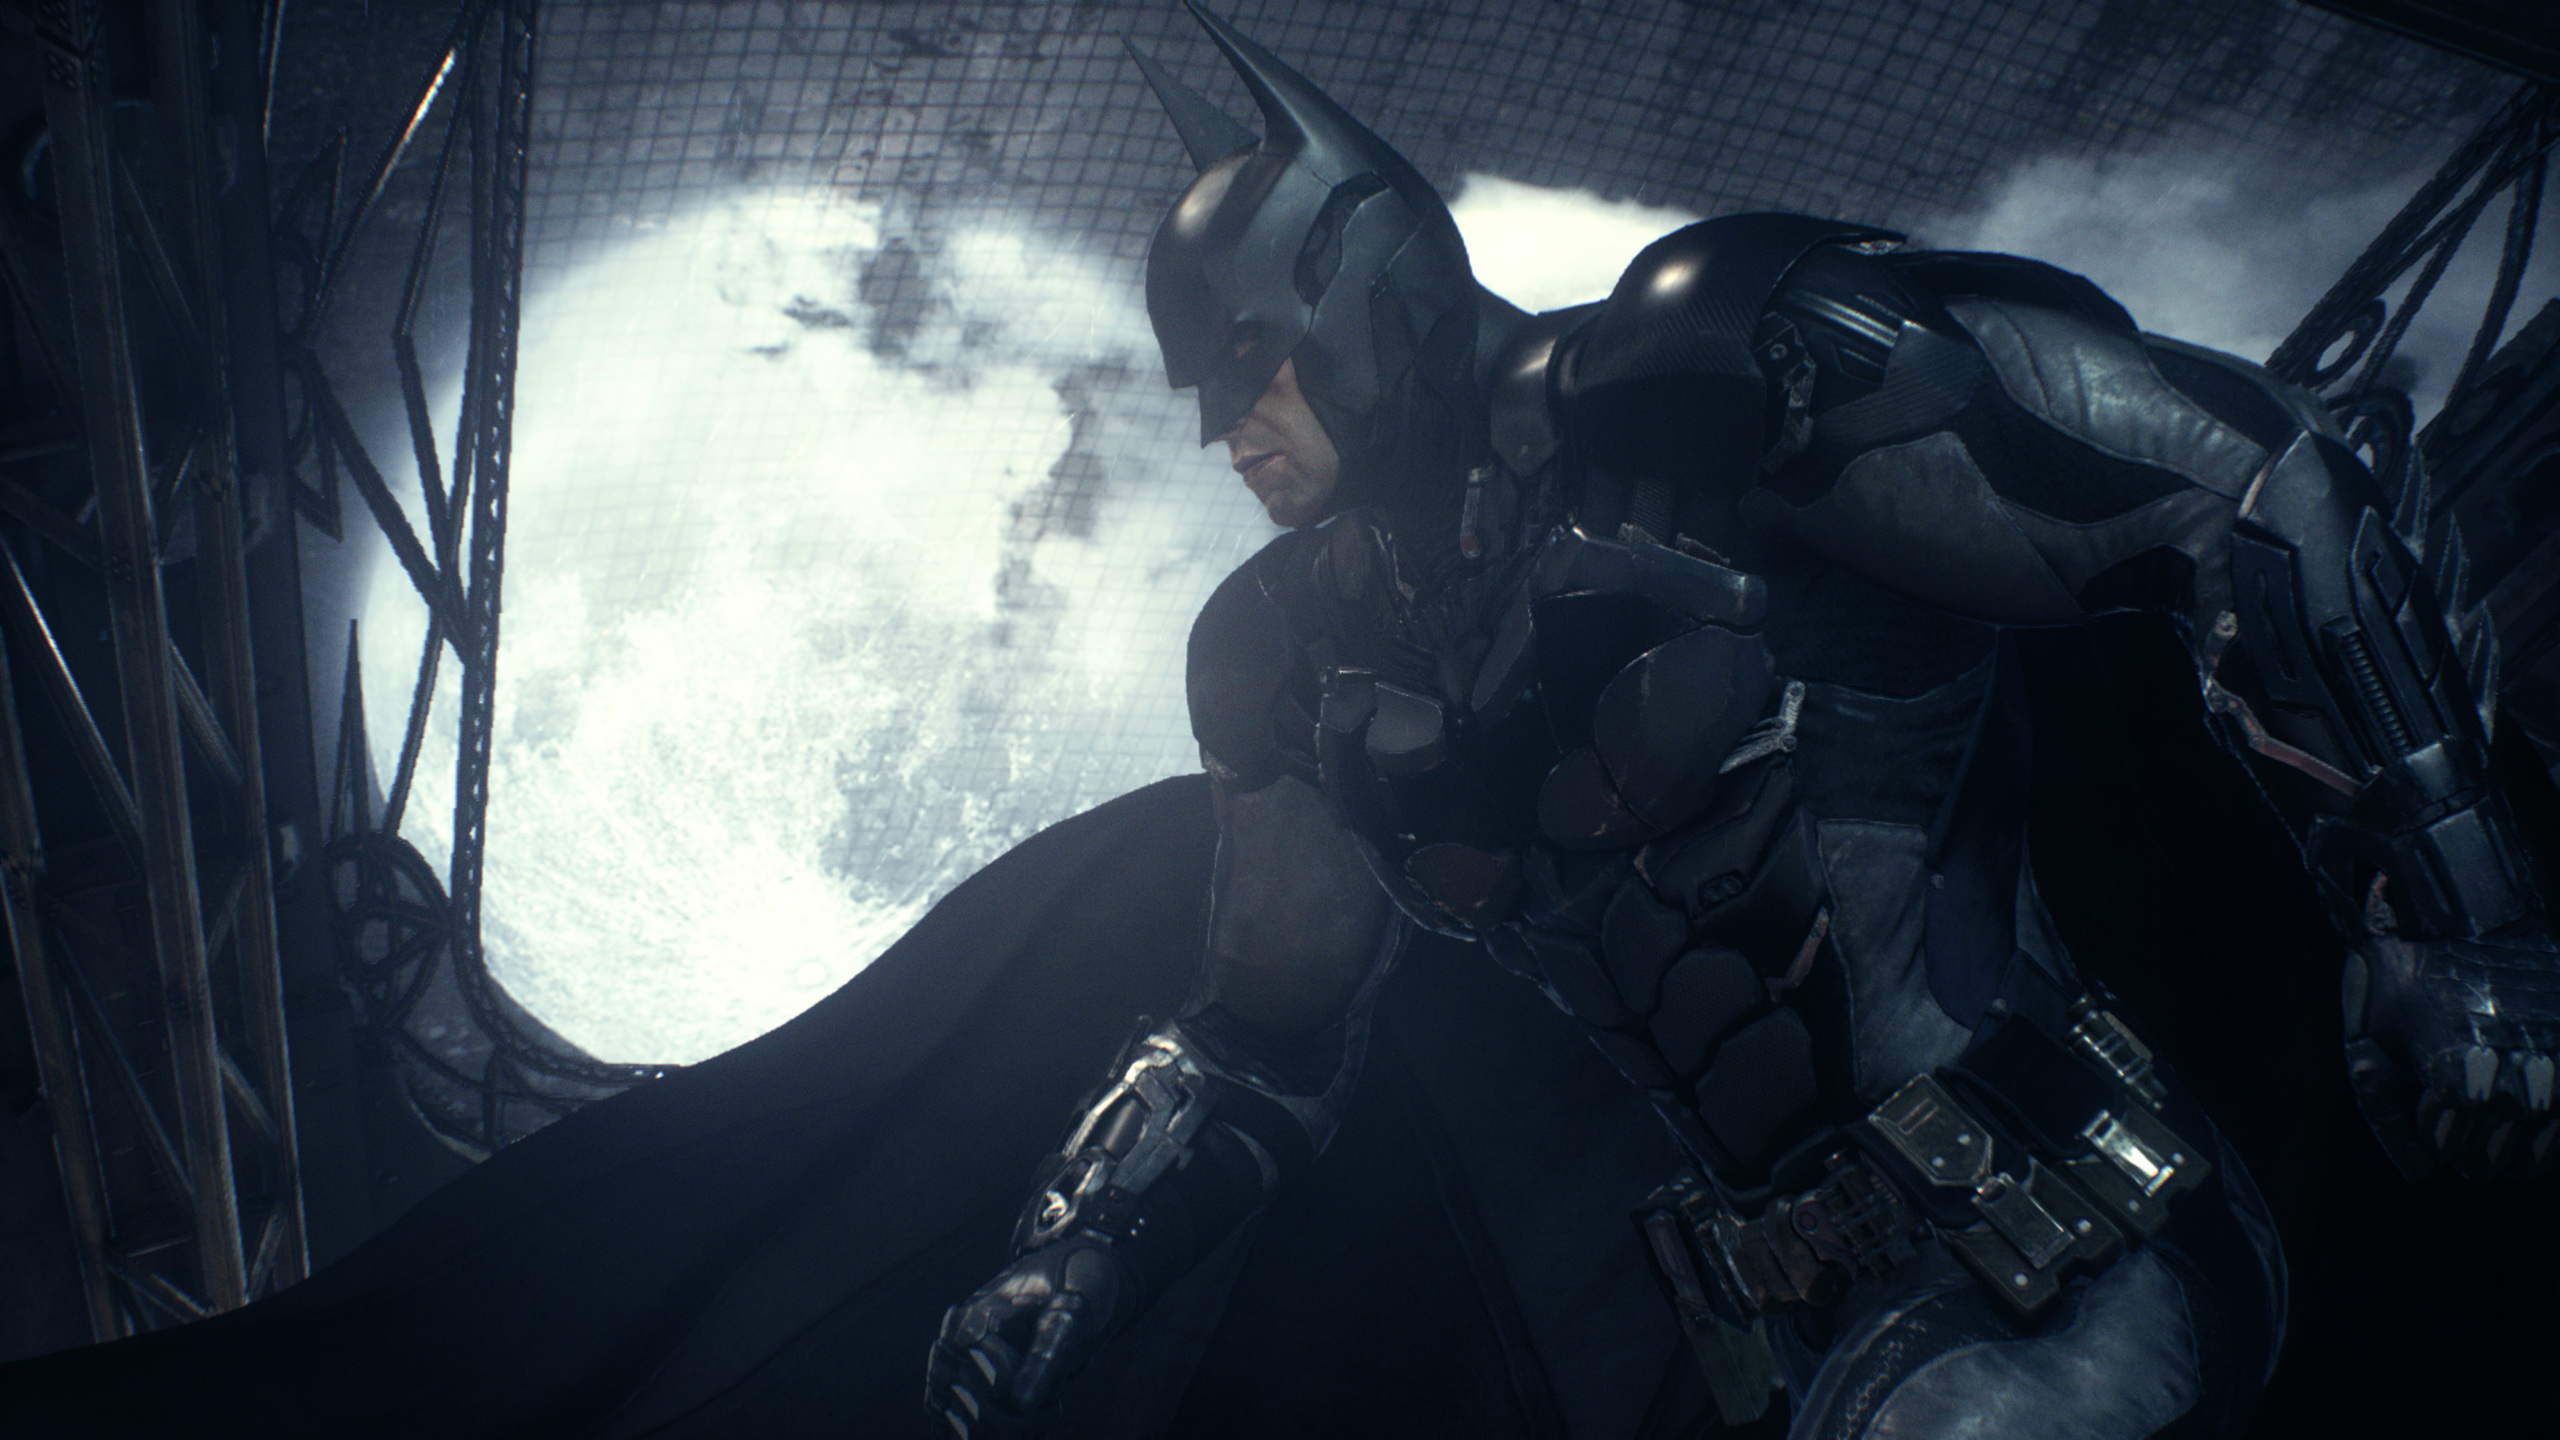 2560x1440 Batman Arkham Knight Art 1440p Resolution Hd 4k Wallpapers